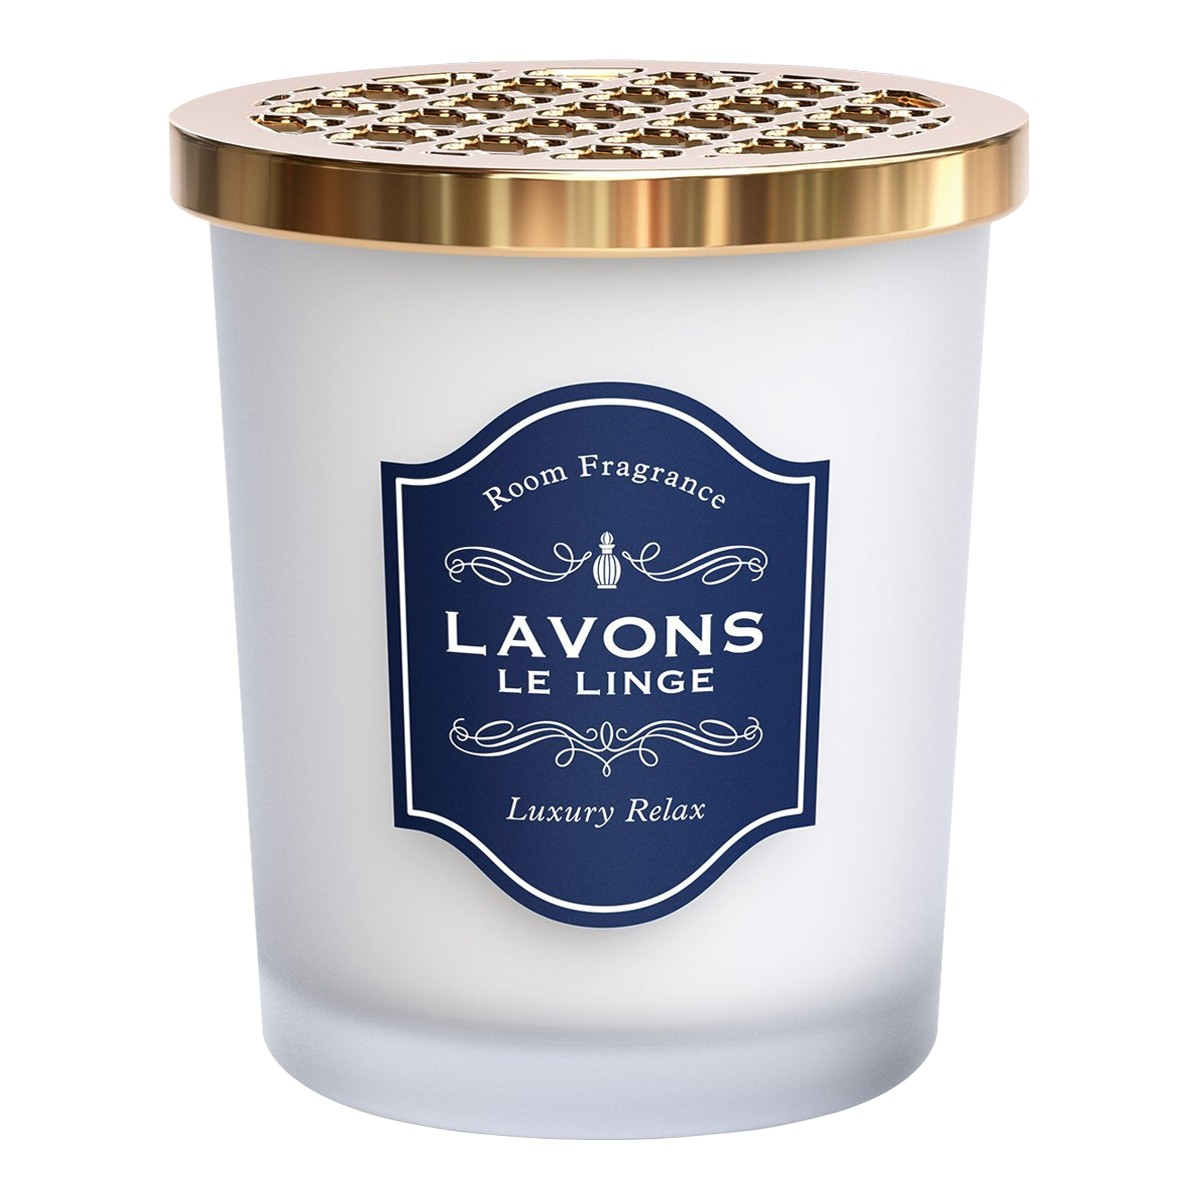 LAVONS LE LINGE Premium Room Aroma Fragrance Gel Deodorizer Luxury Relax 150g